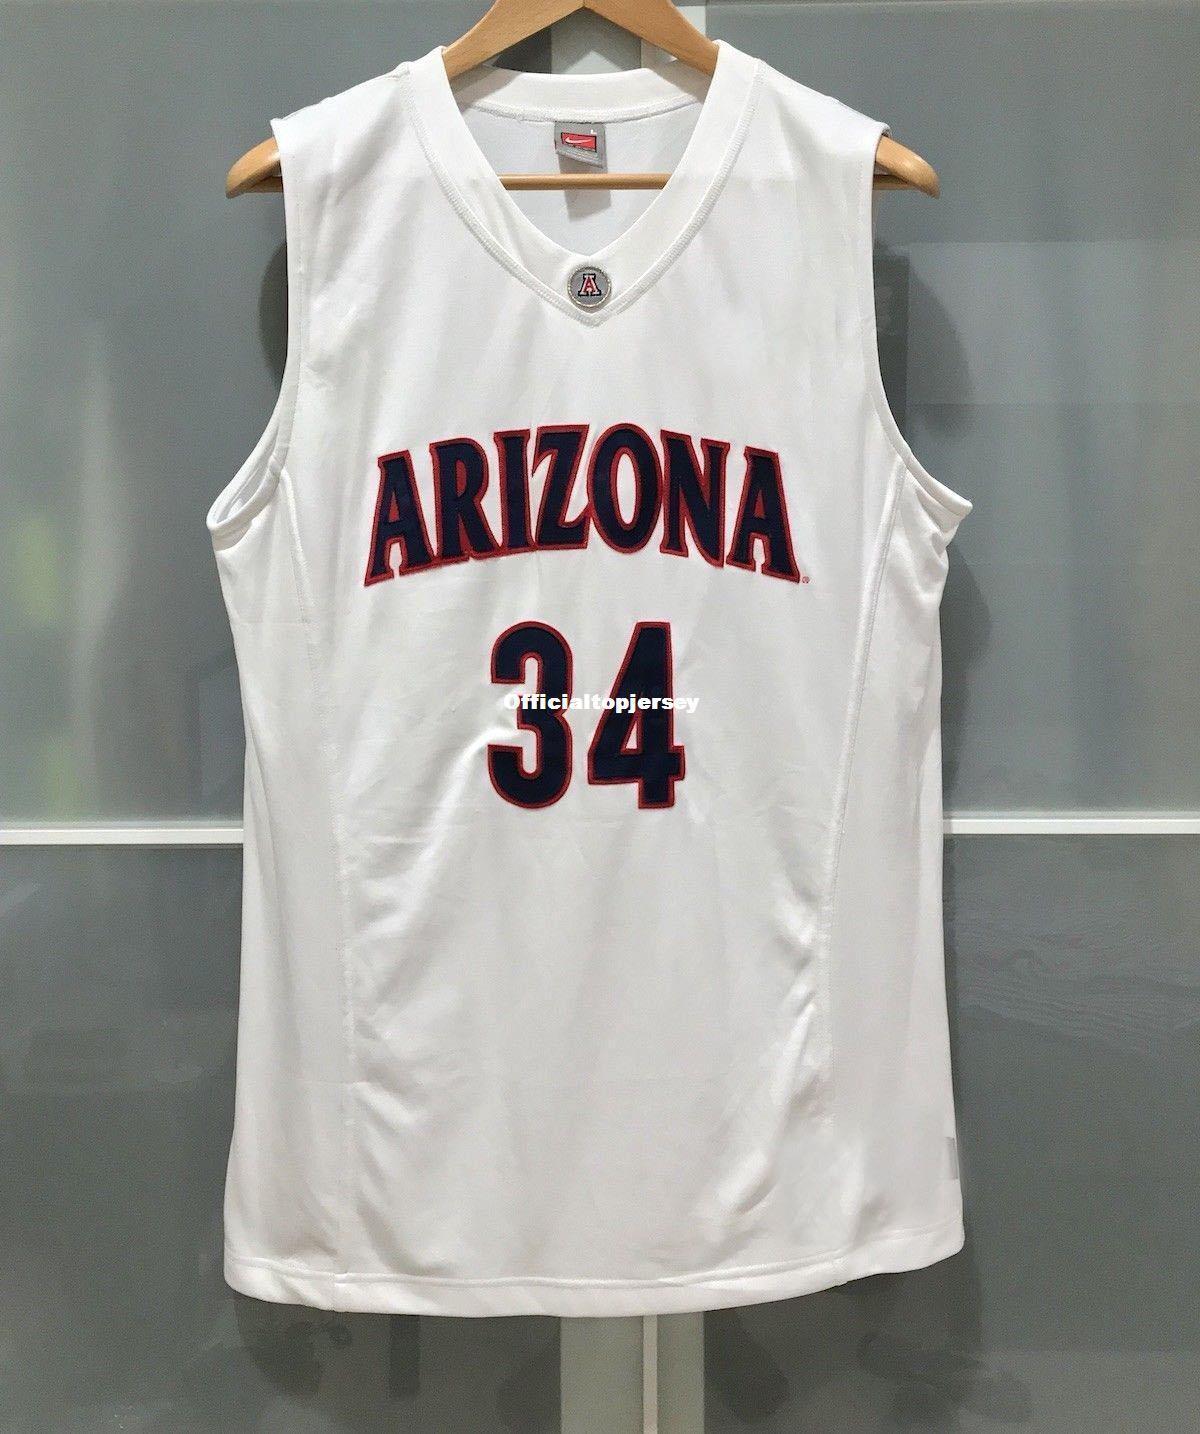 Cheap Wholesale Retro ARIZONA WILDCATS  34 MENS BASKETBALL GAME JERSEY WHITE  T-shirt Vest Stitched Basketball Jerseys Cheap WILDCATS Jersey ARIZONA  Jerseys ... f7c29091a